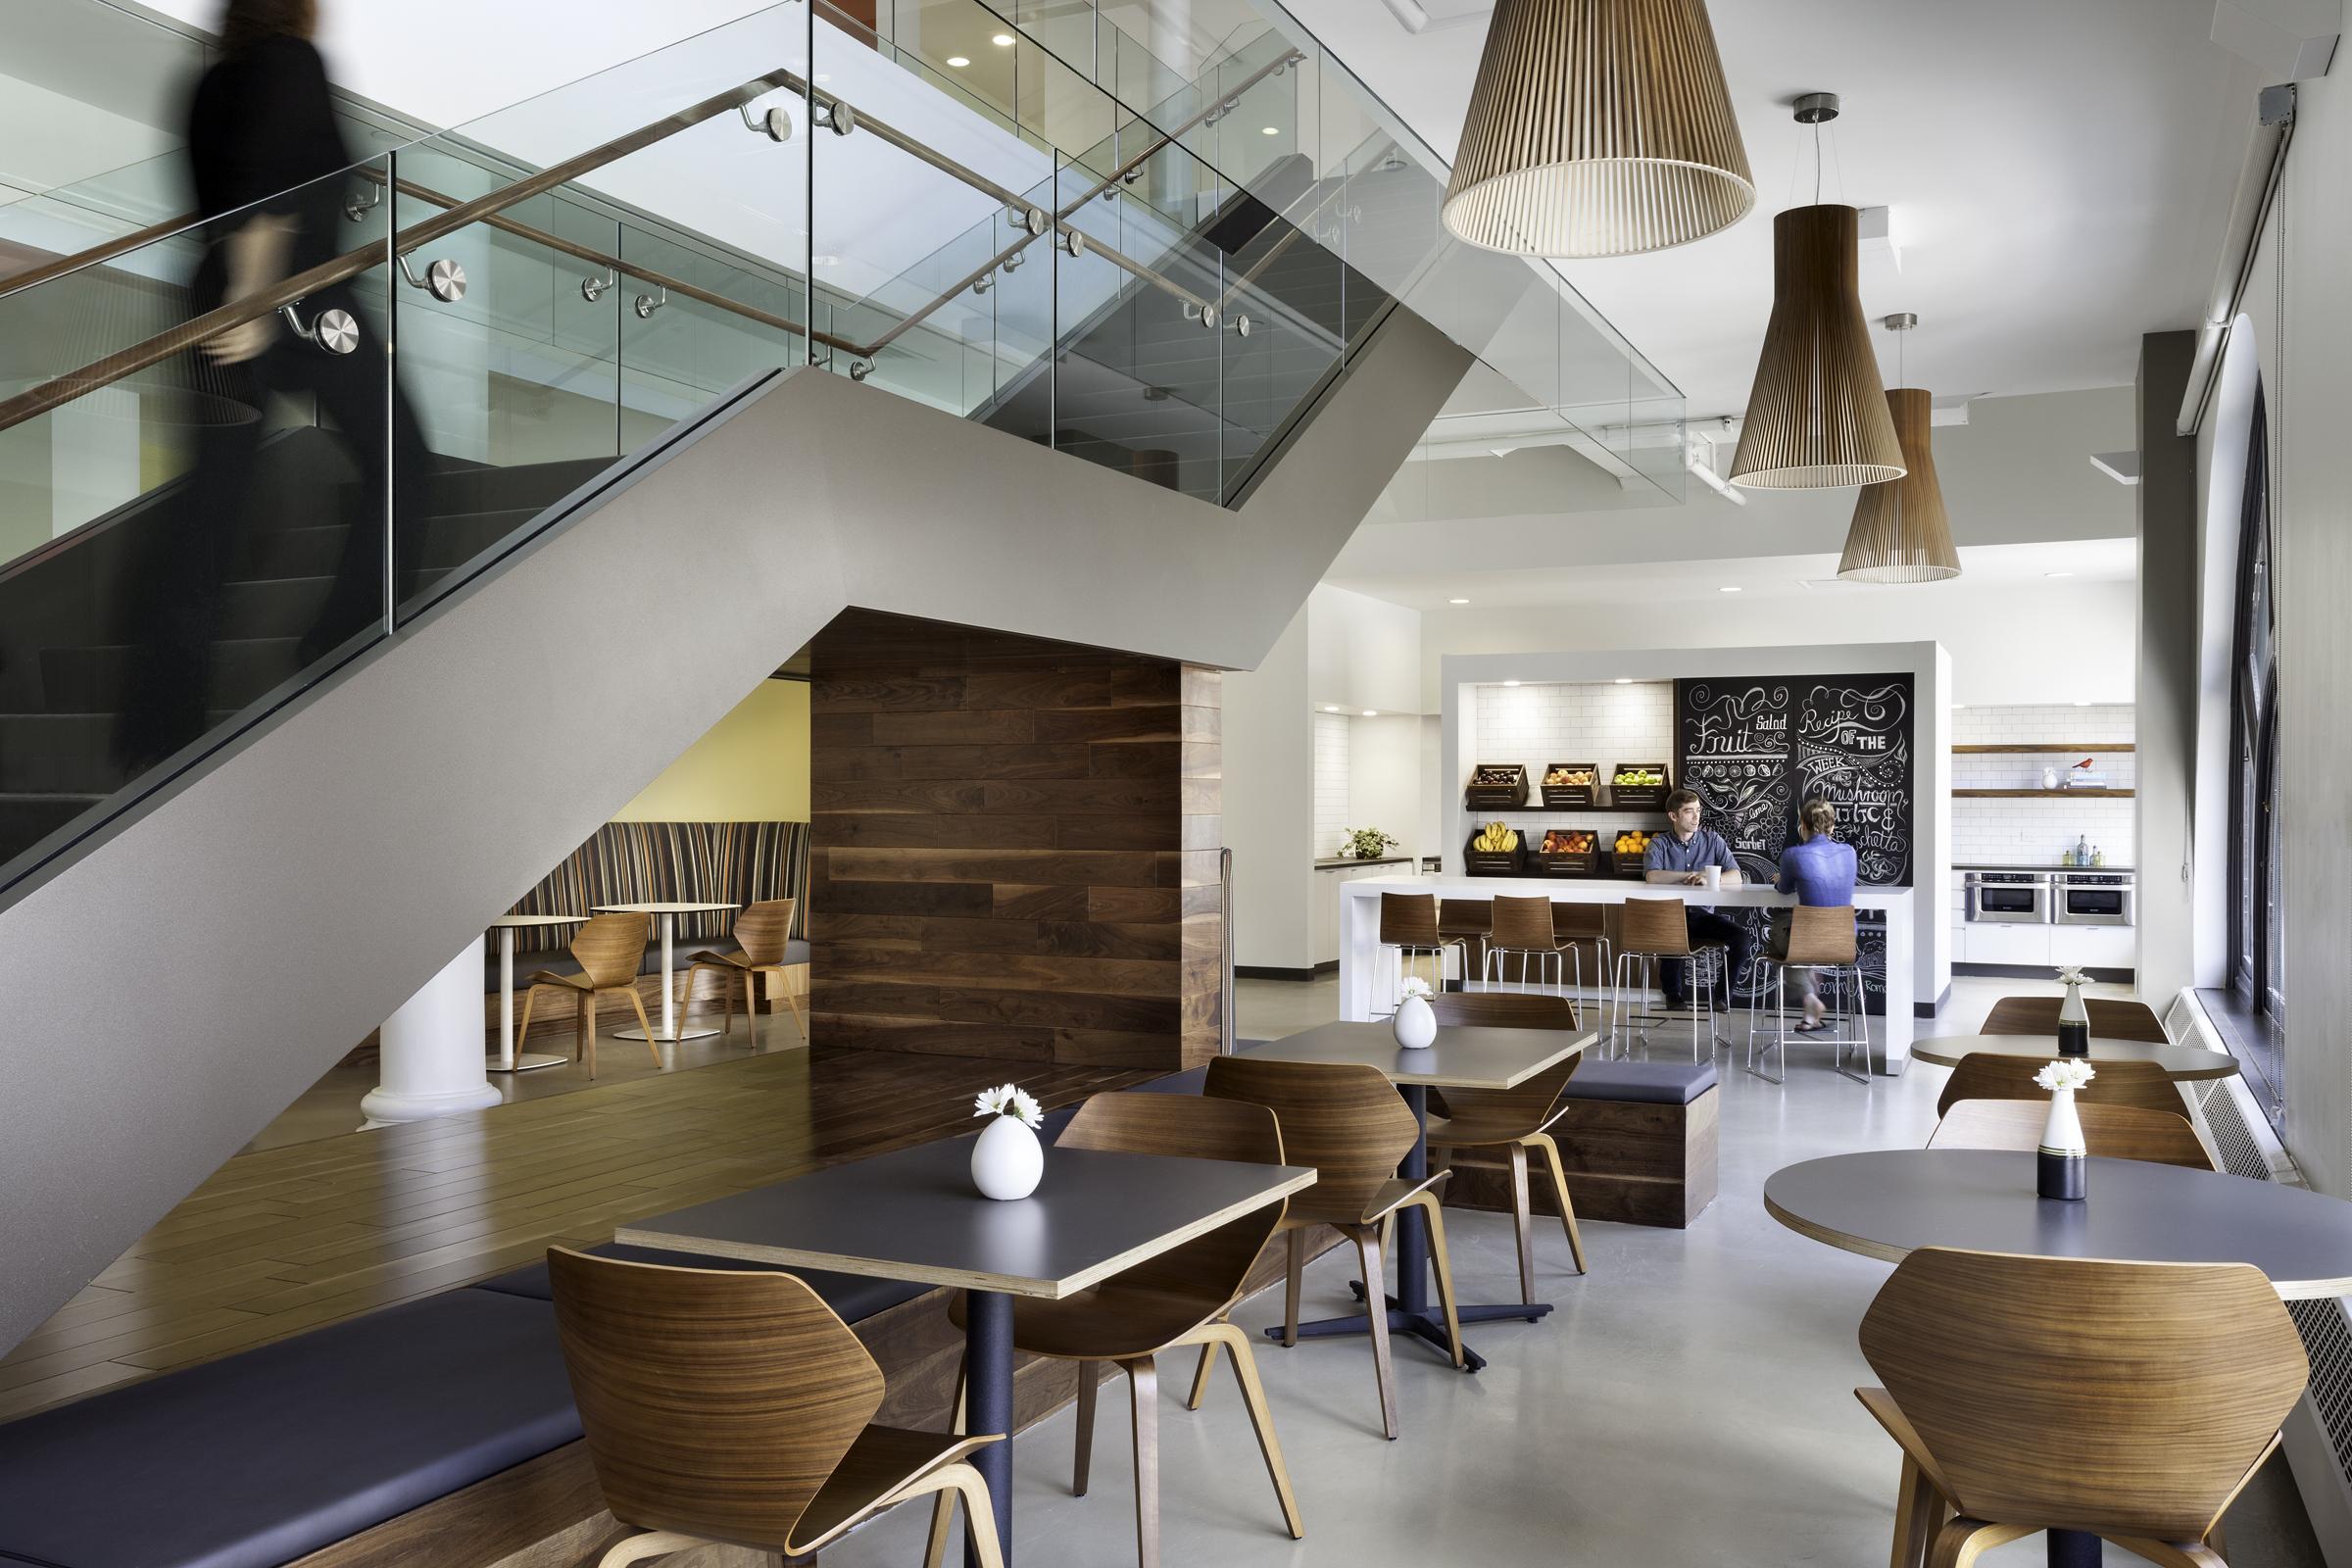 cafe workplace.jpg